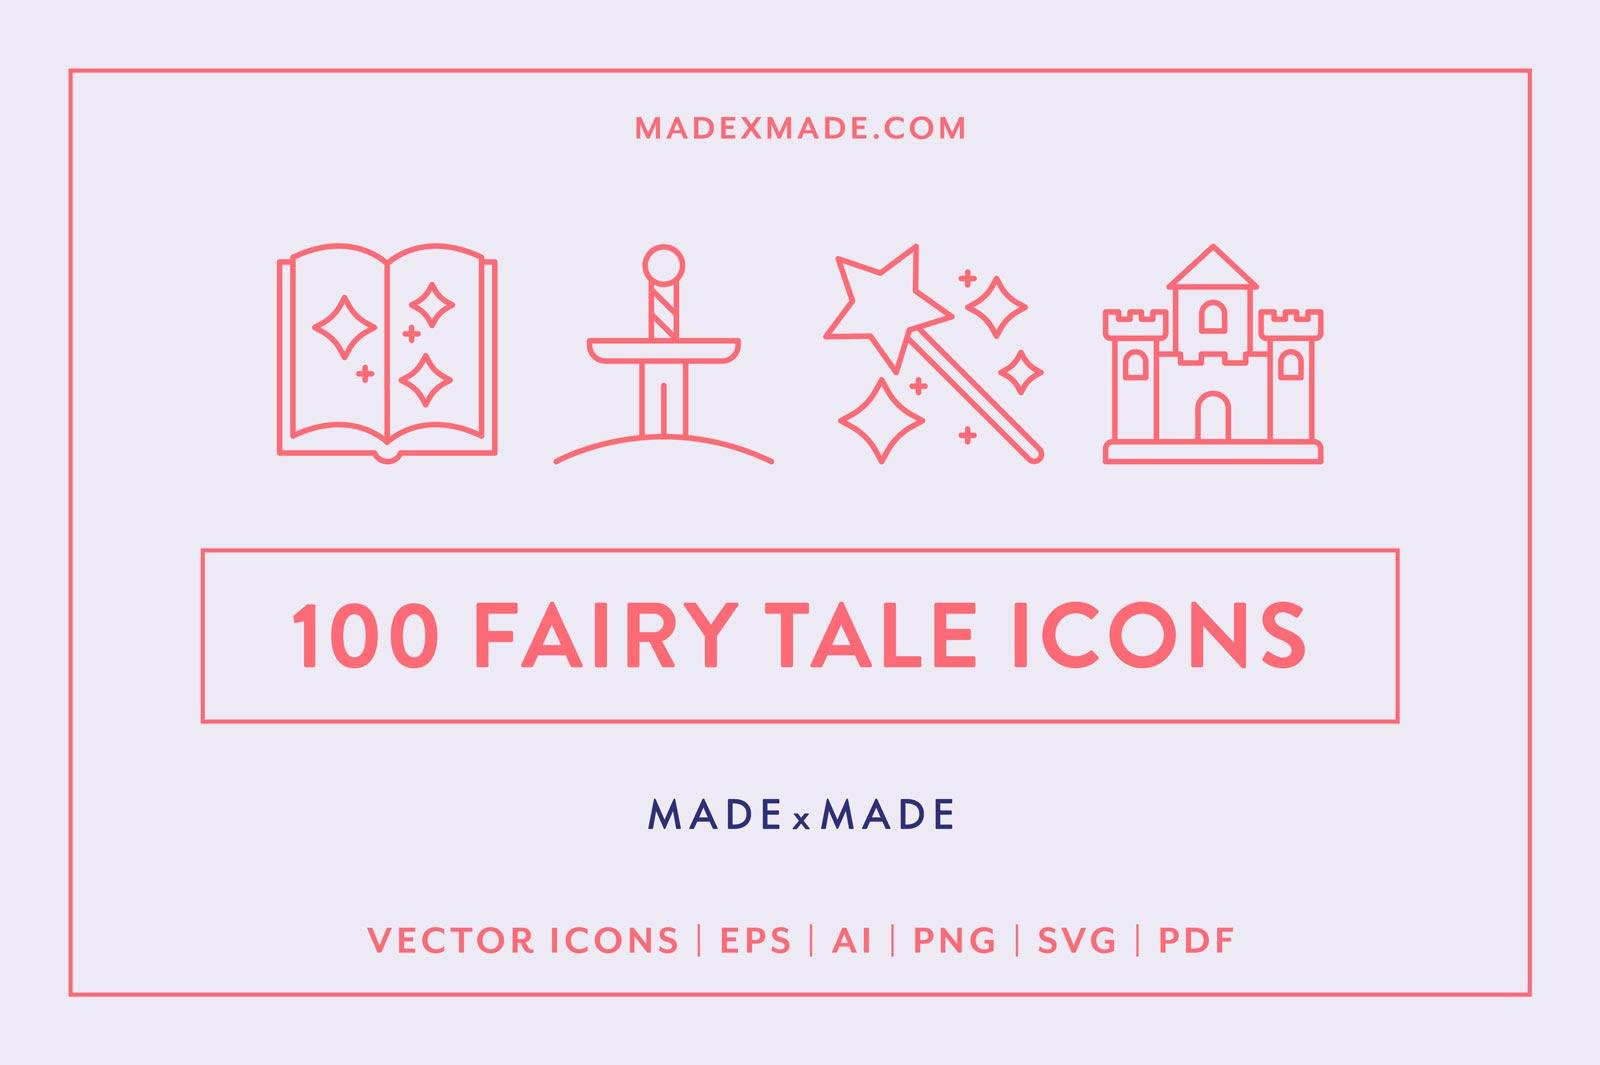 made x made fairytale